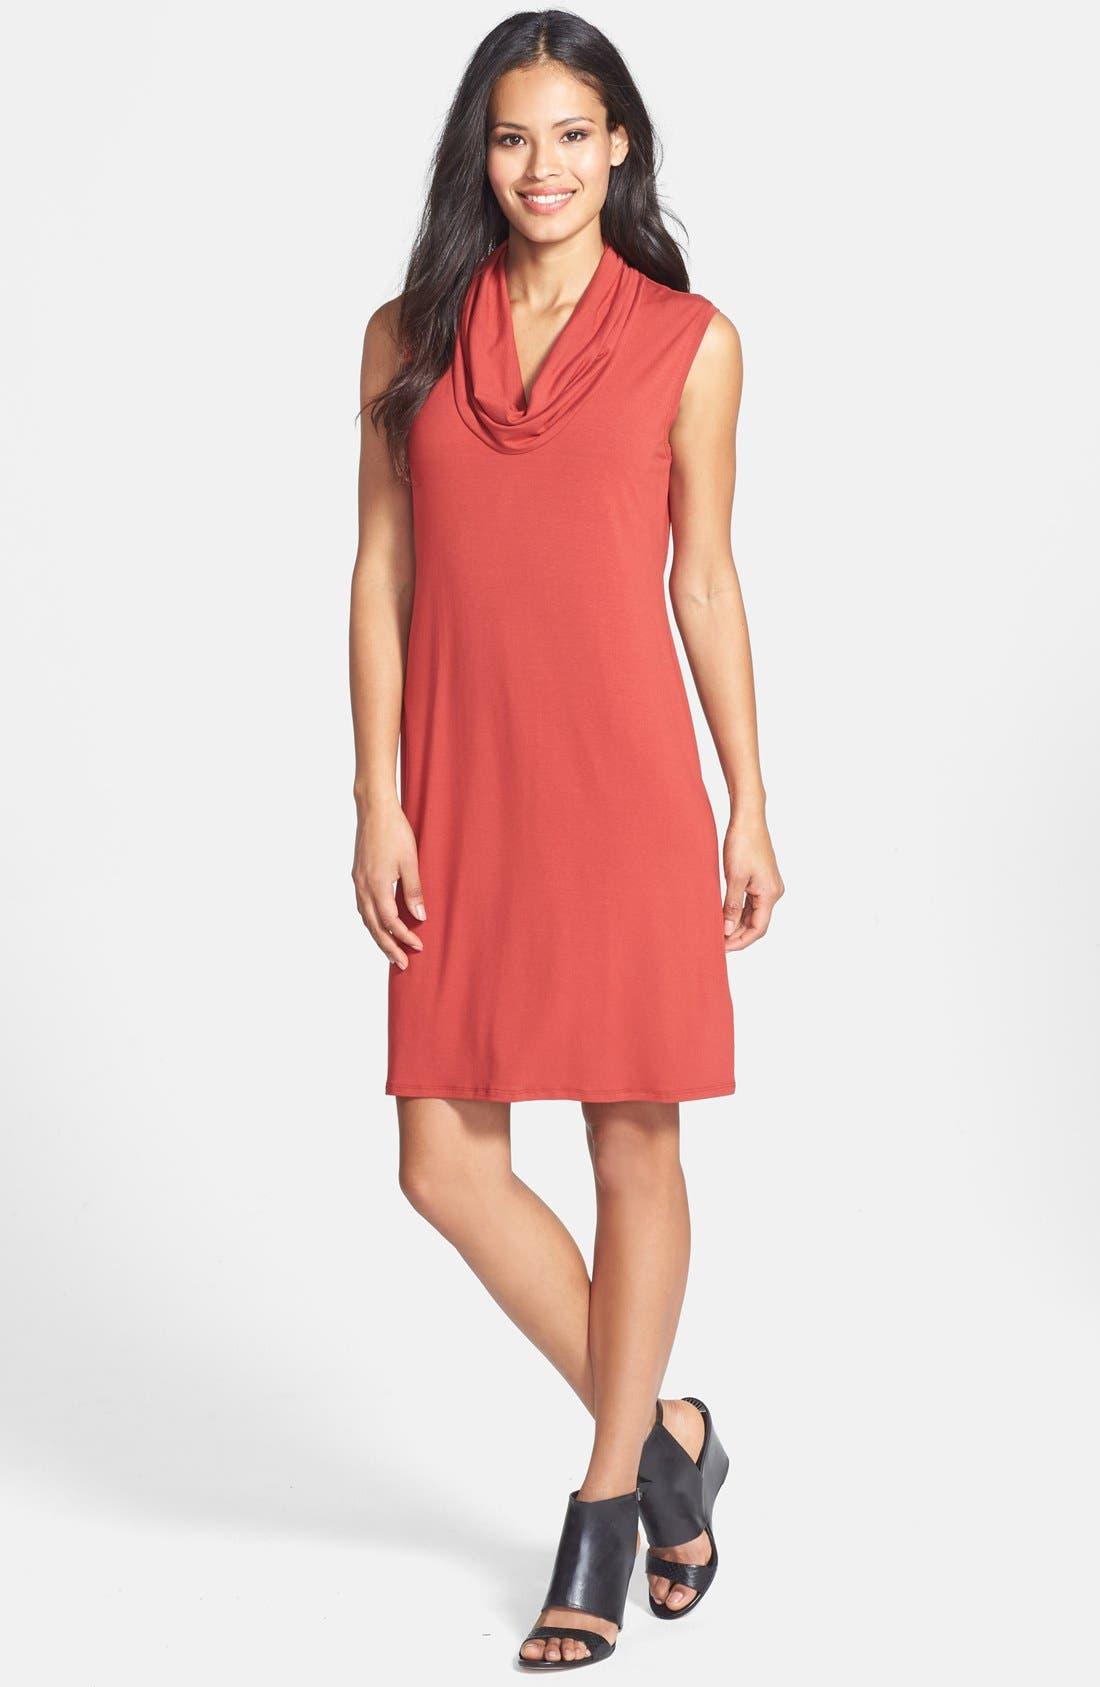 Alternate Image 1 Selected - Eileen Fisher Cowl Neck Jersey Dress (Regular & Petite)